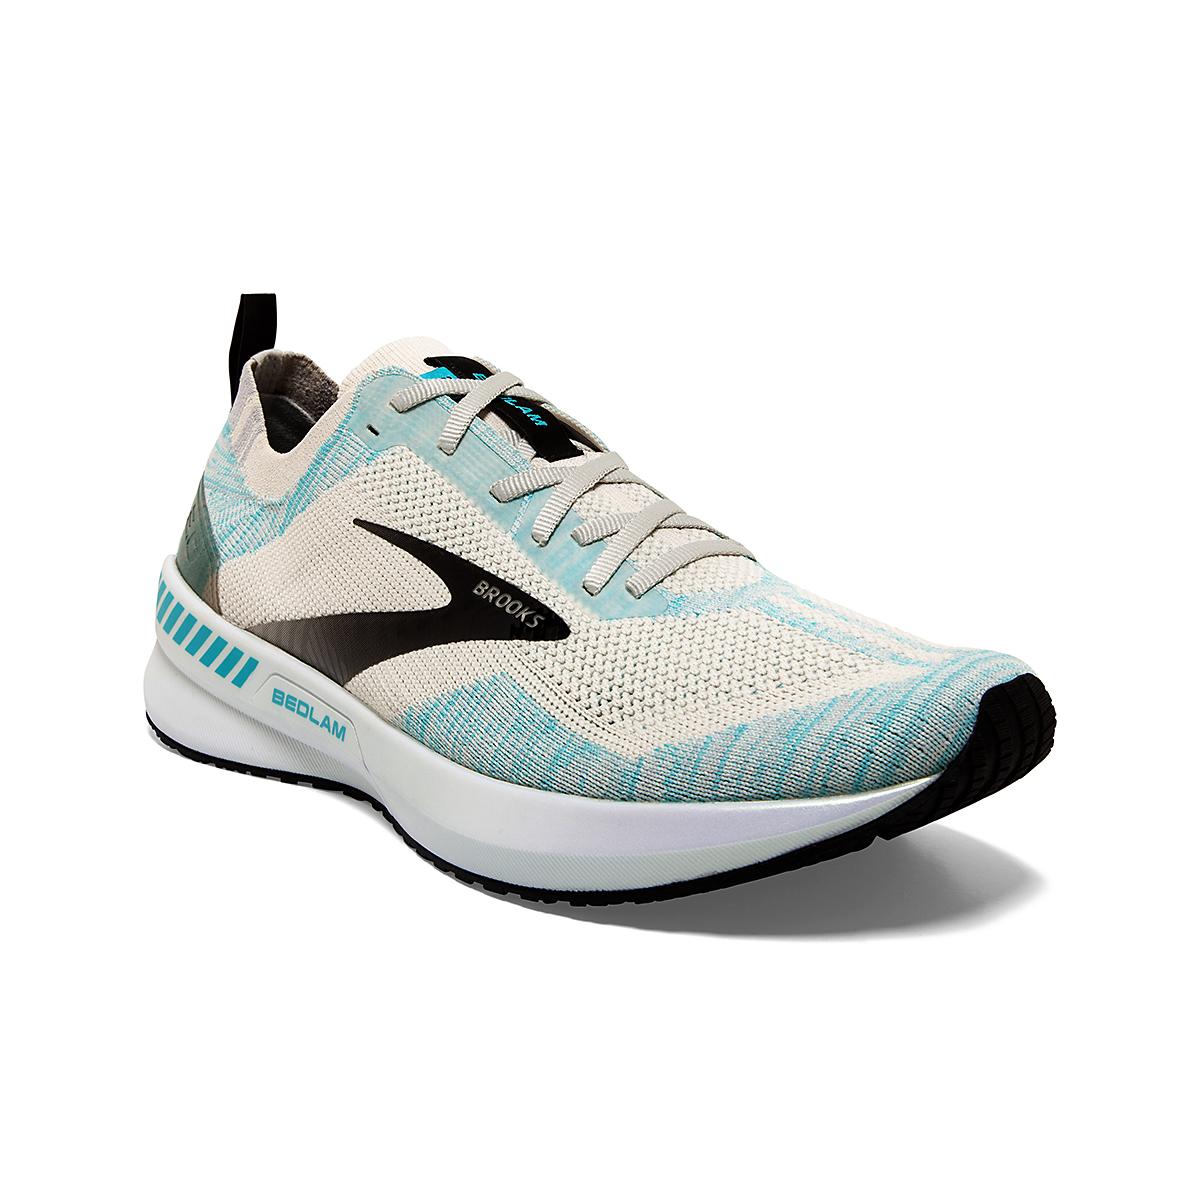 Men's Brooks Bedlam 3 Running Shoe - Color: Jet Stream/Antarctica/Capri - Size: 7 - Width: Regular, Jet Stream/Antarctica/Capri, large, image 3